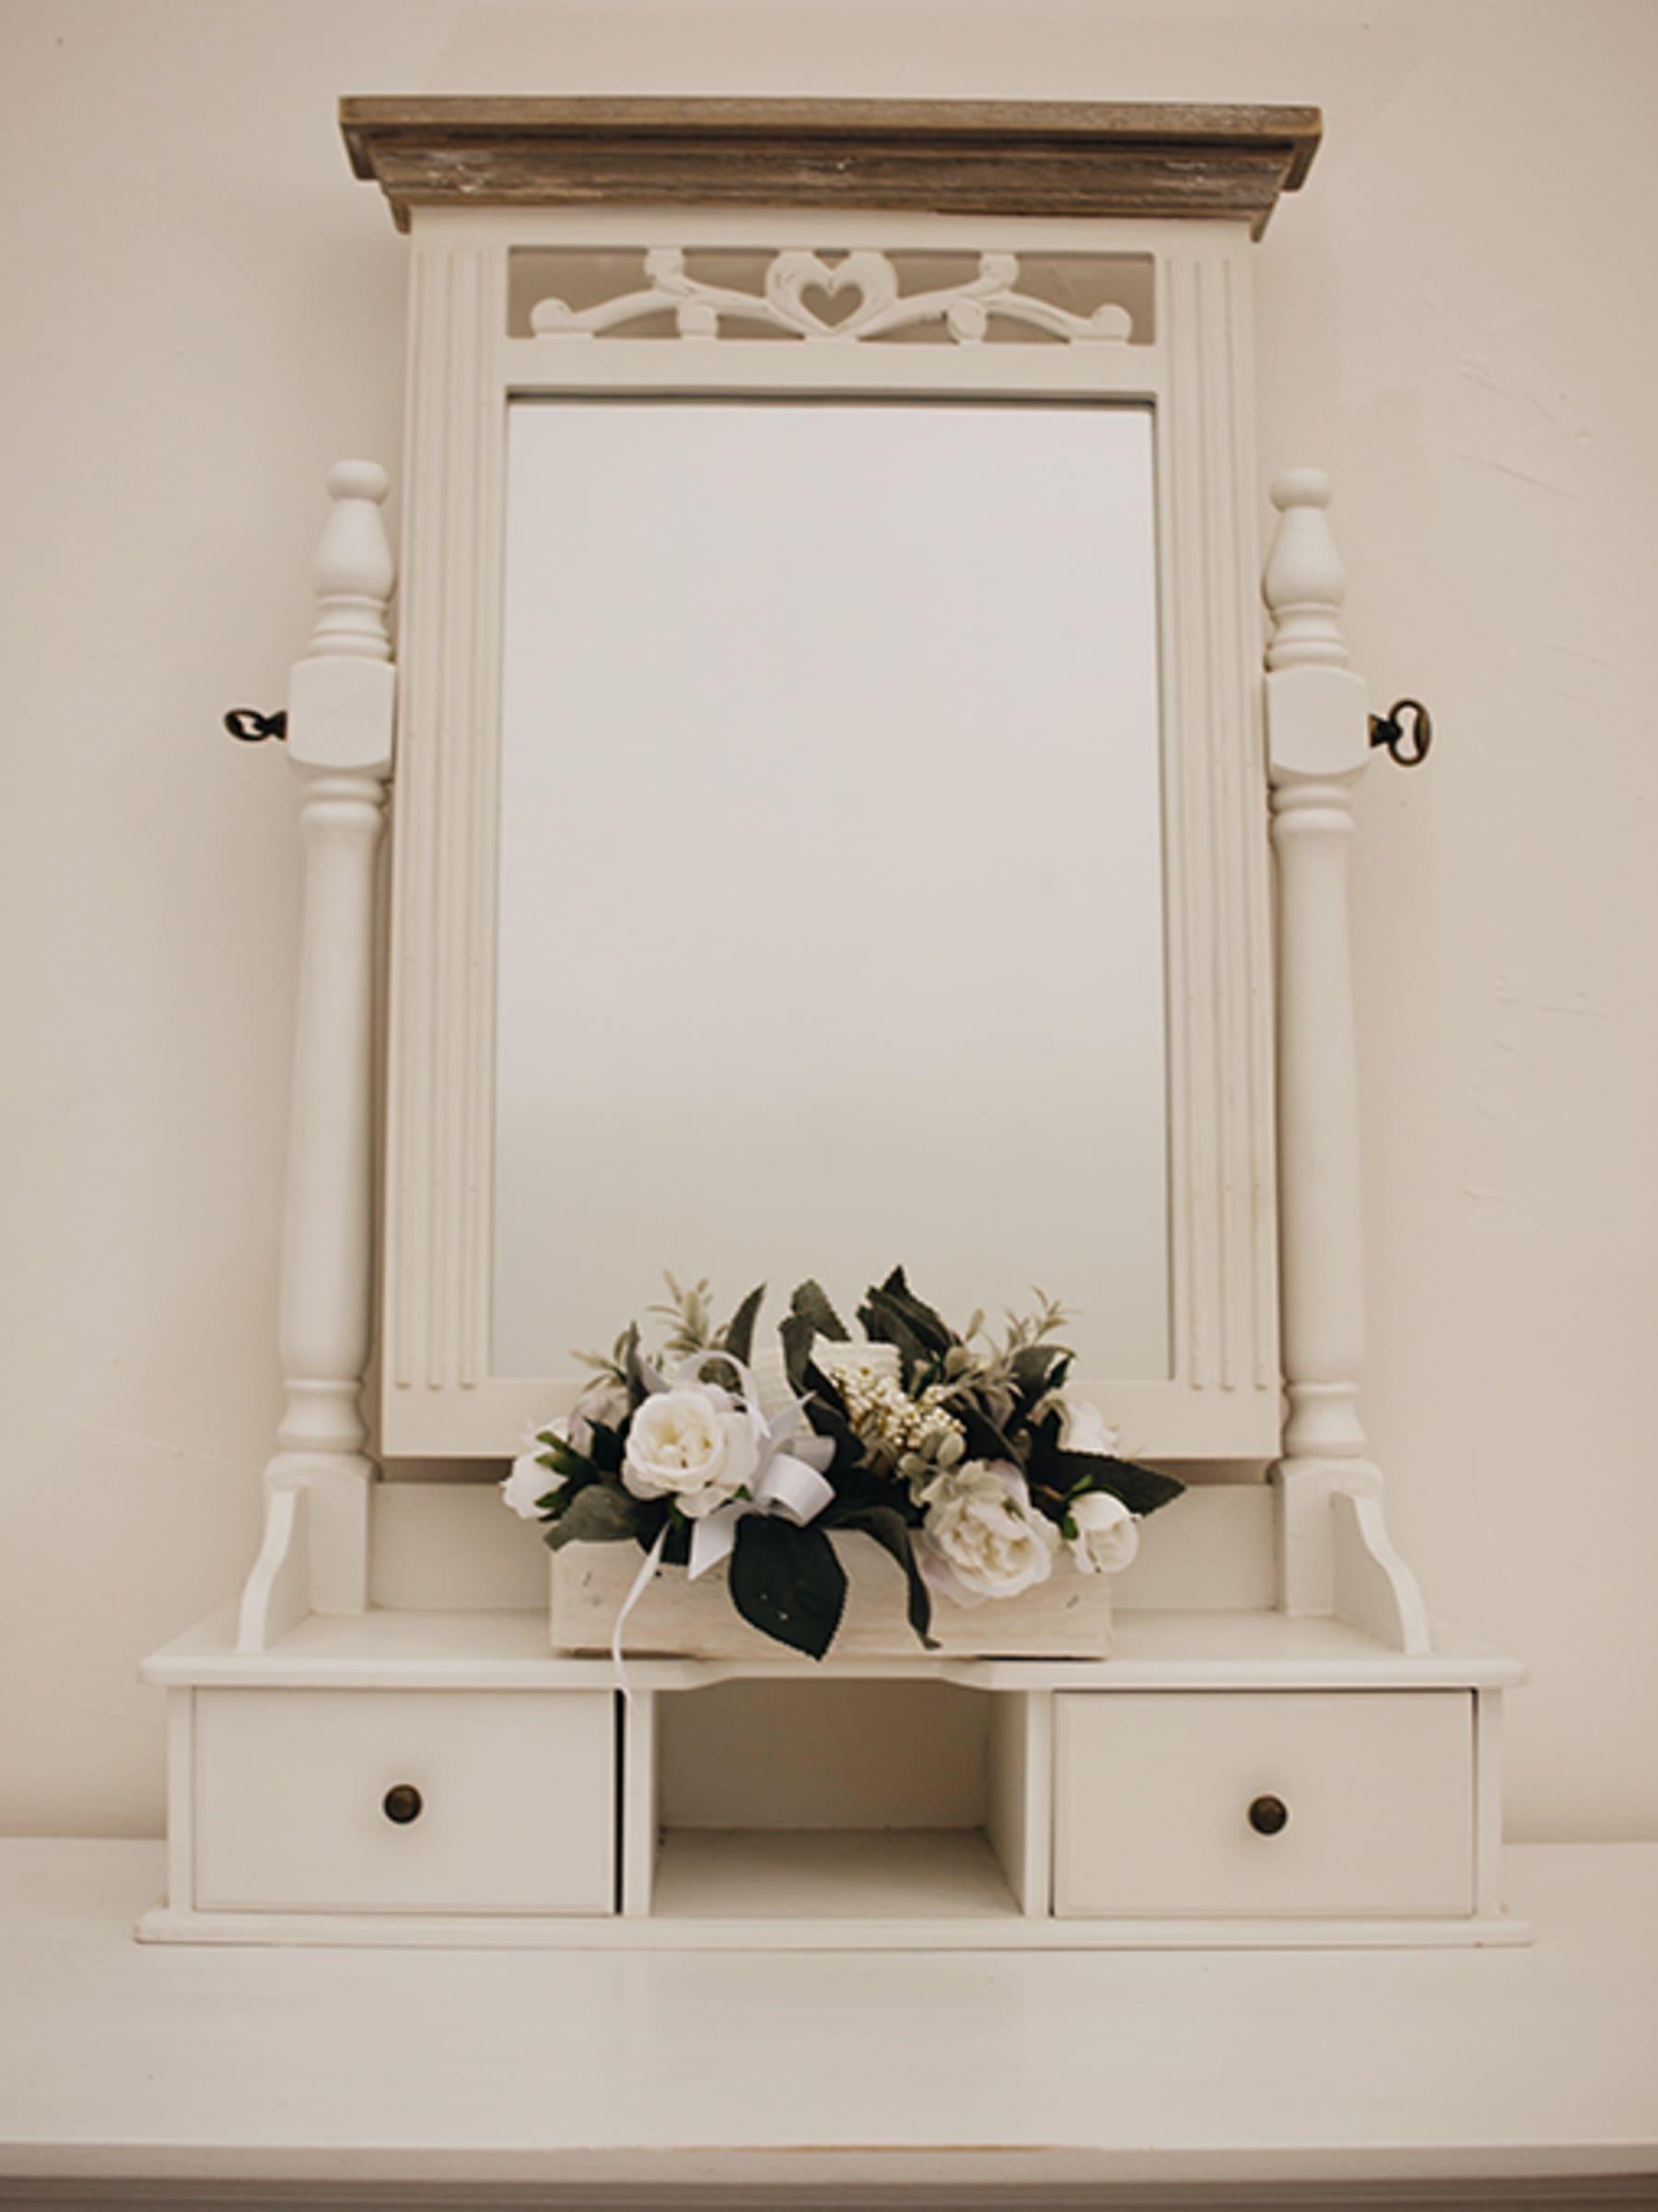 lorenzongift specchio luna da tavolo olimpiahome